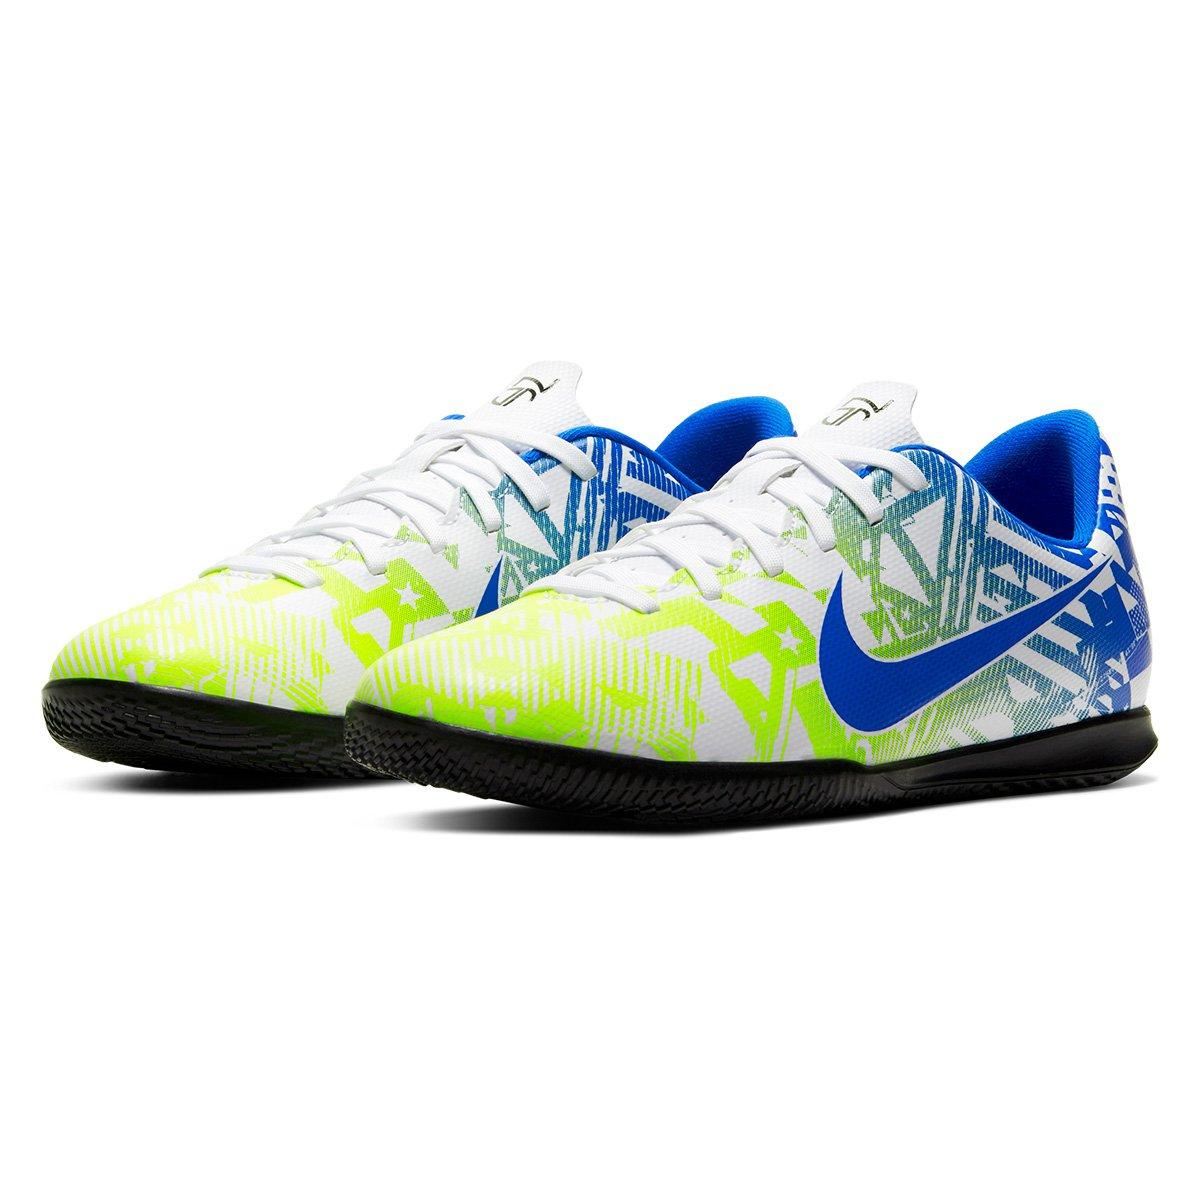 Siempre Elegante Adecuado  Chuteira Futsal Juvenil Nike Mercurial Vapor 13 Club Neymar Jr IC - Branco  e Azul   Allianz Parque Shop